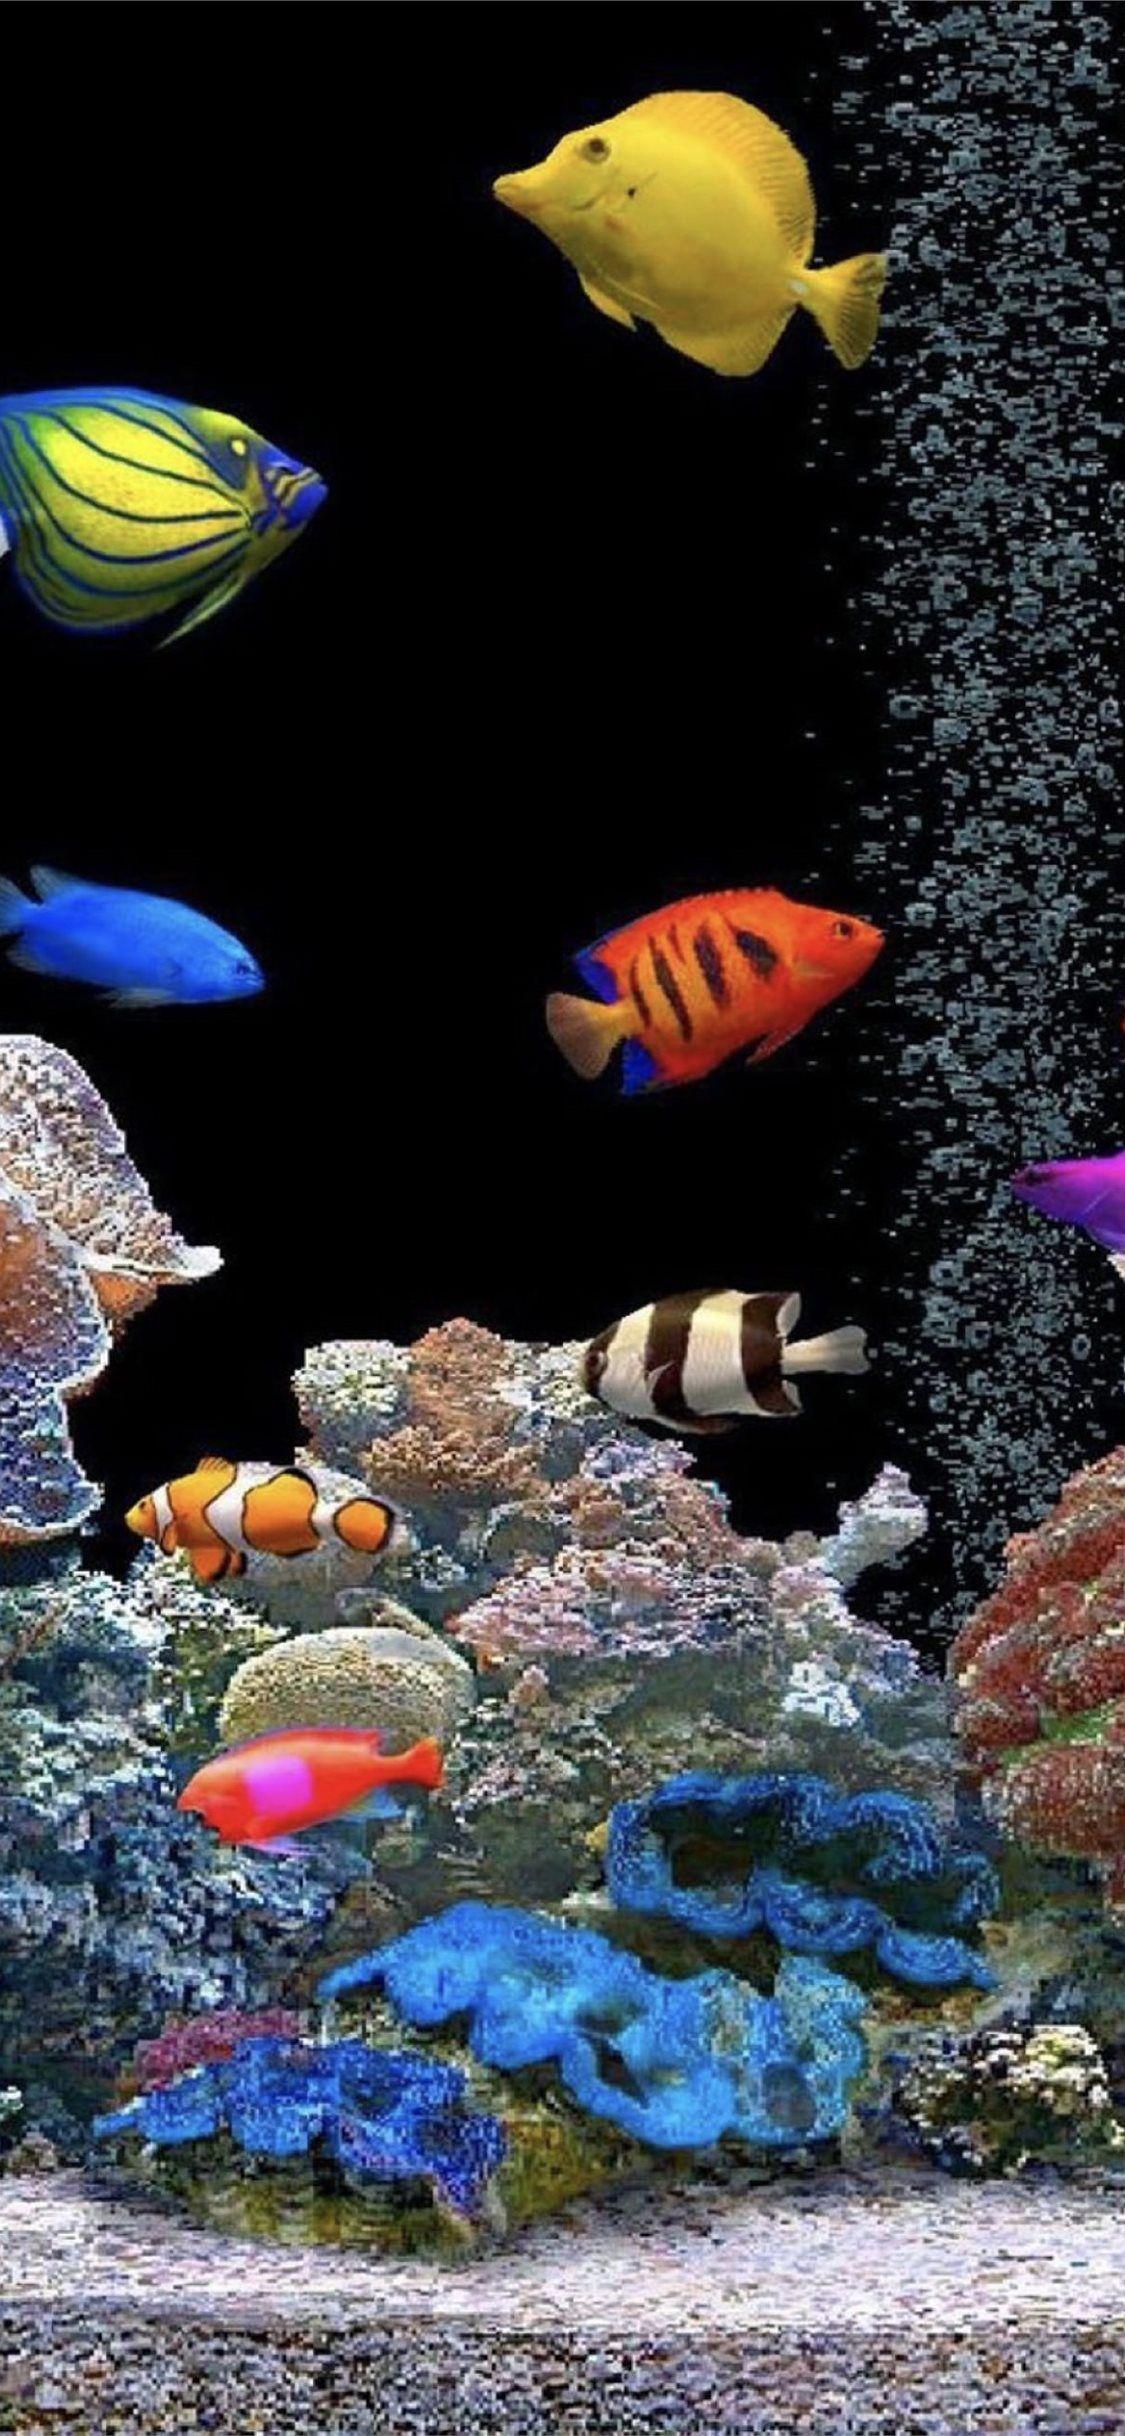 Aquarium Tank Colorful Parallax Trends Iphone11wallpaper In 2020 Tank Wallpaper Live Fish Wallpaper Fish Wallpaper